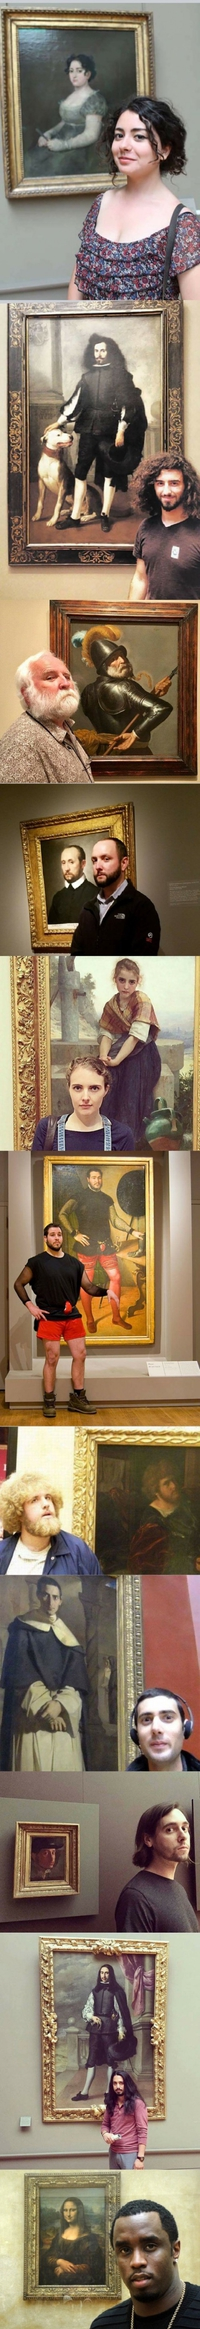 Kan tu vas au musée